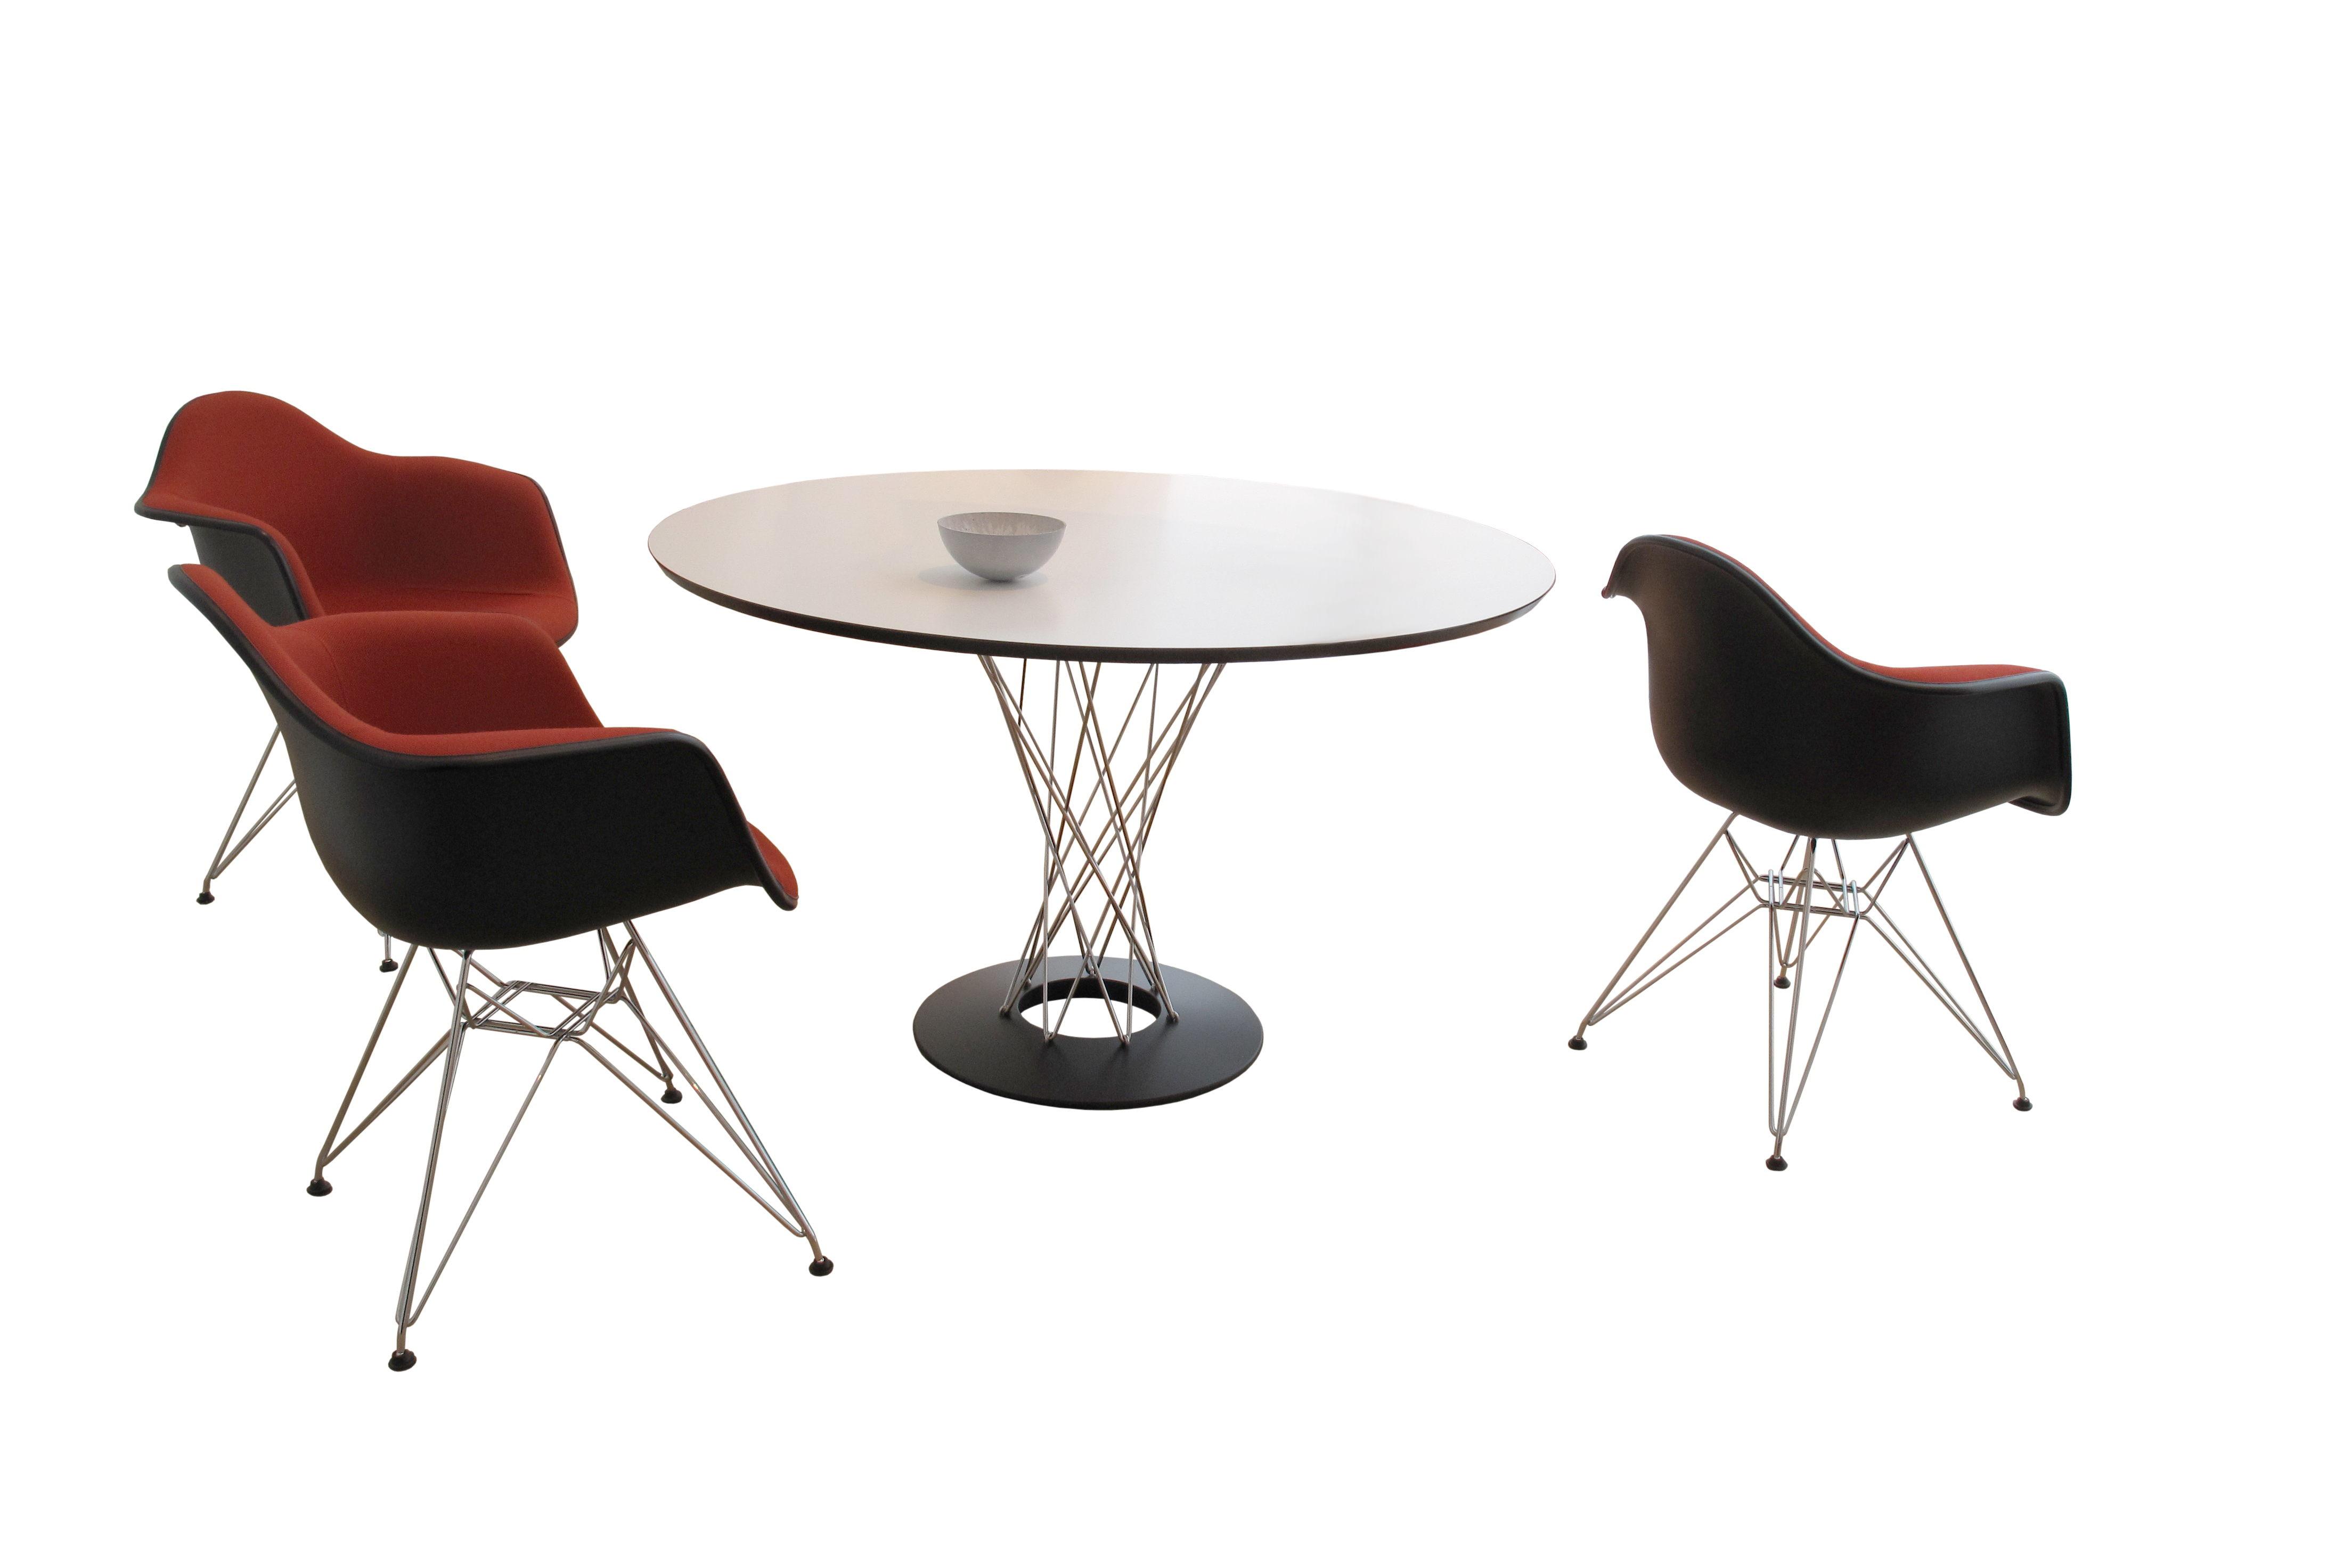 Eames Plastic Armchair Wiki  Armchair Wiki   uballs com. Philippe Starck Ghost Chair Wikipedia. Home Design Ideas